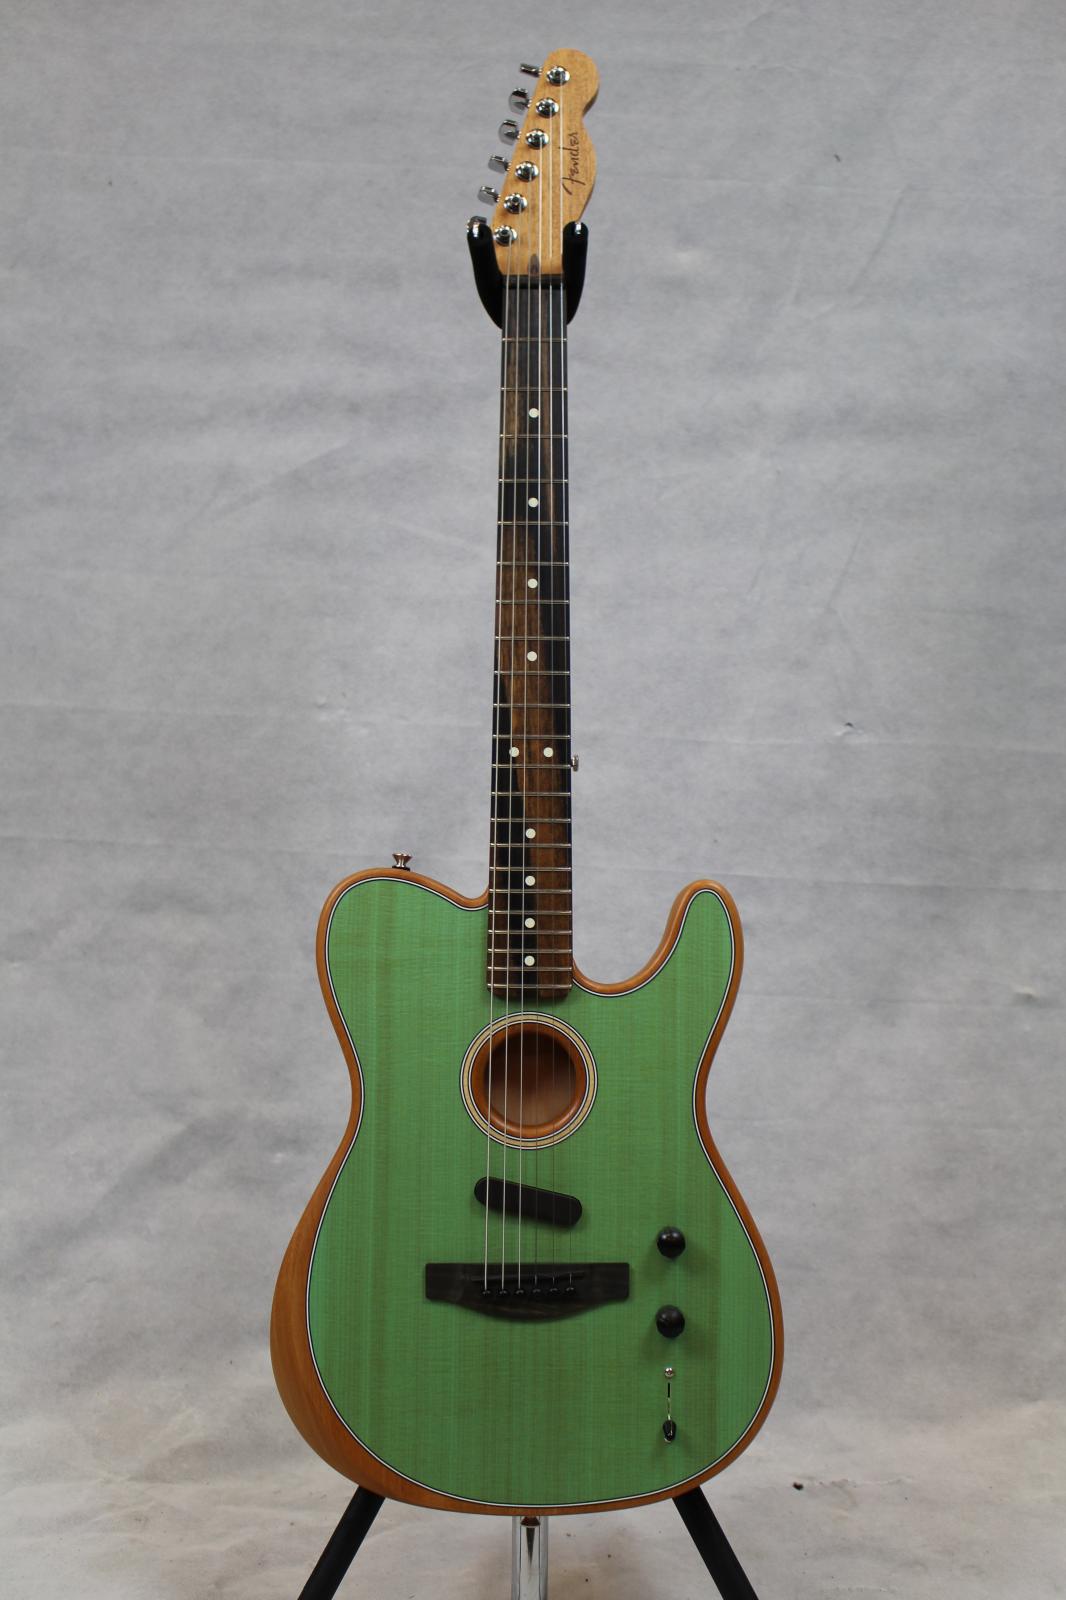 Fender American Acoustasonic Telecaster Seafoam Green